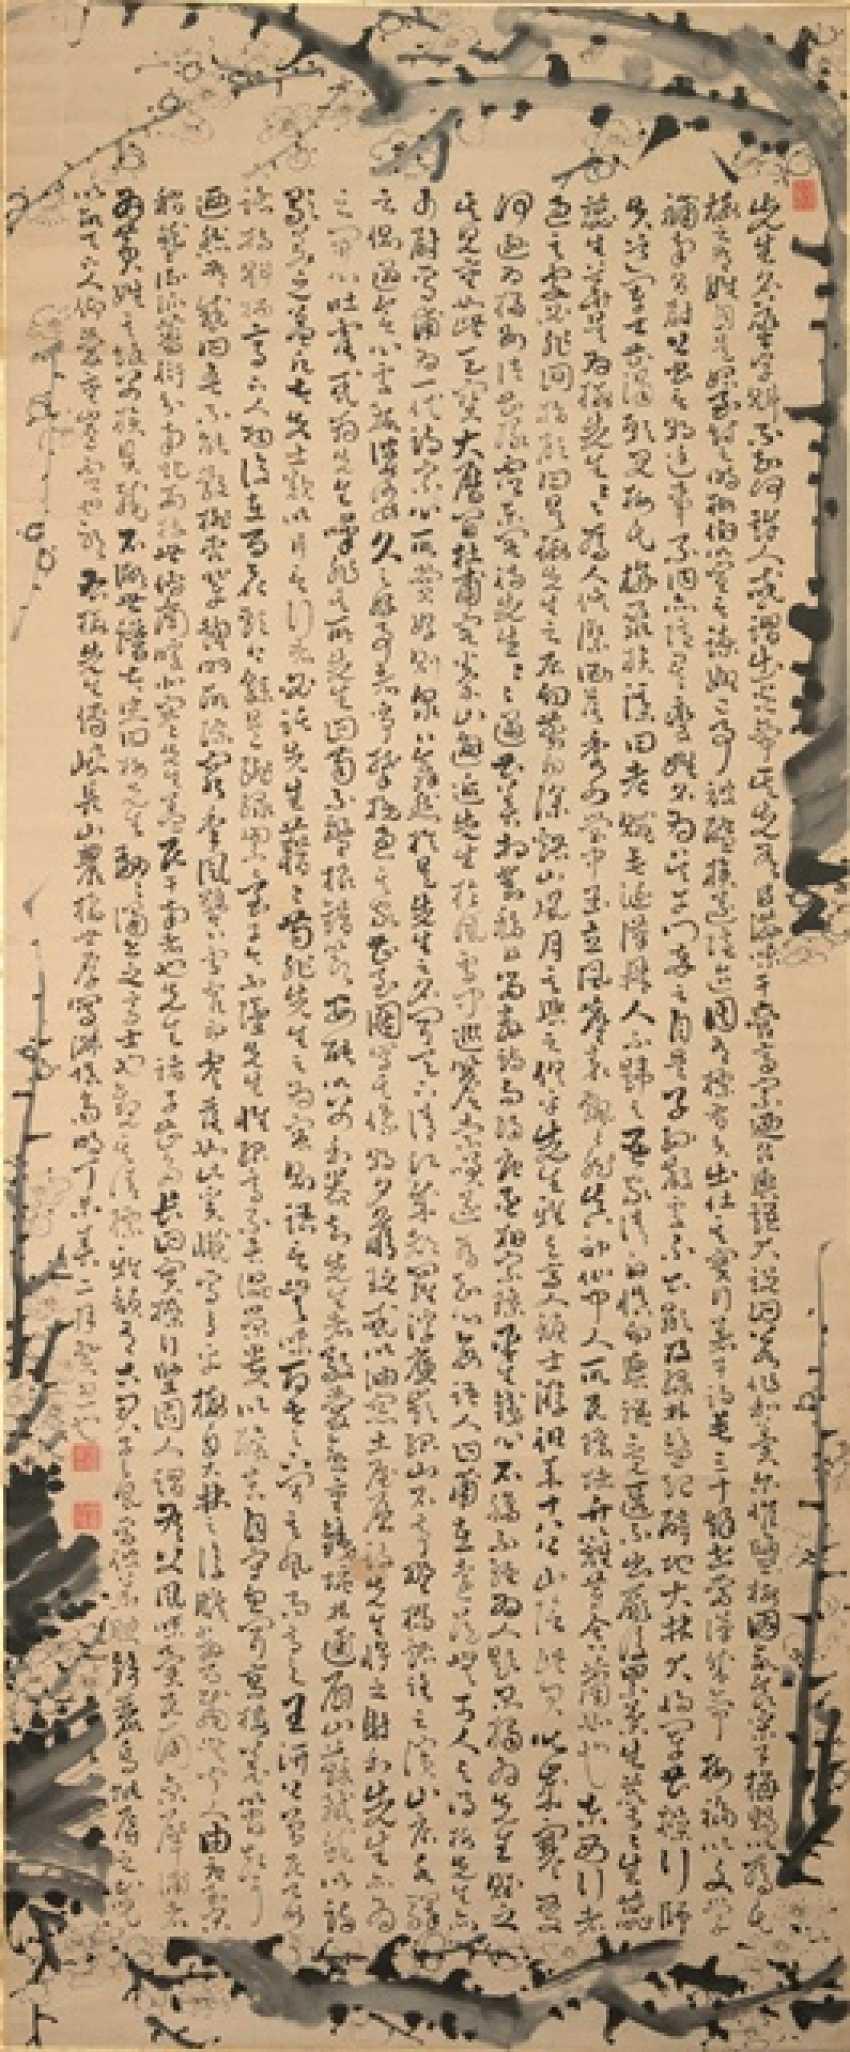 Calligraphy - photo 1